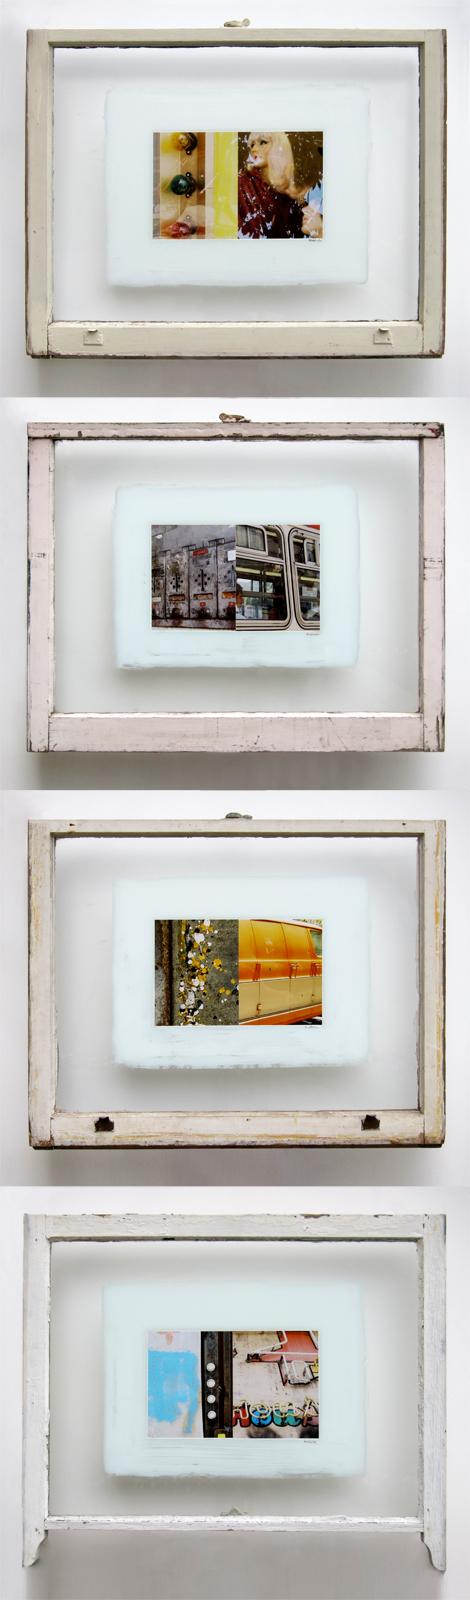 Photos-and-Windows-Eric-Ulrich